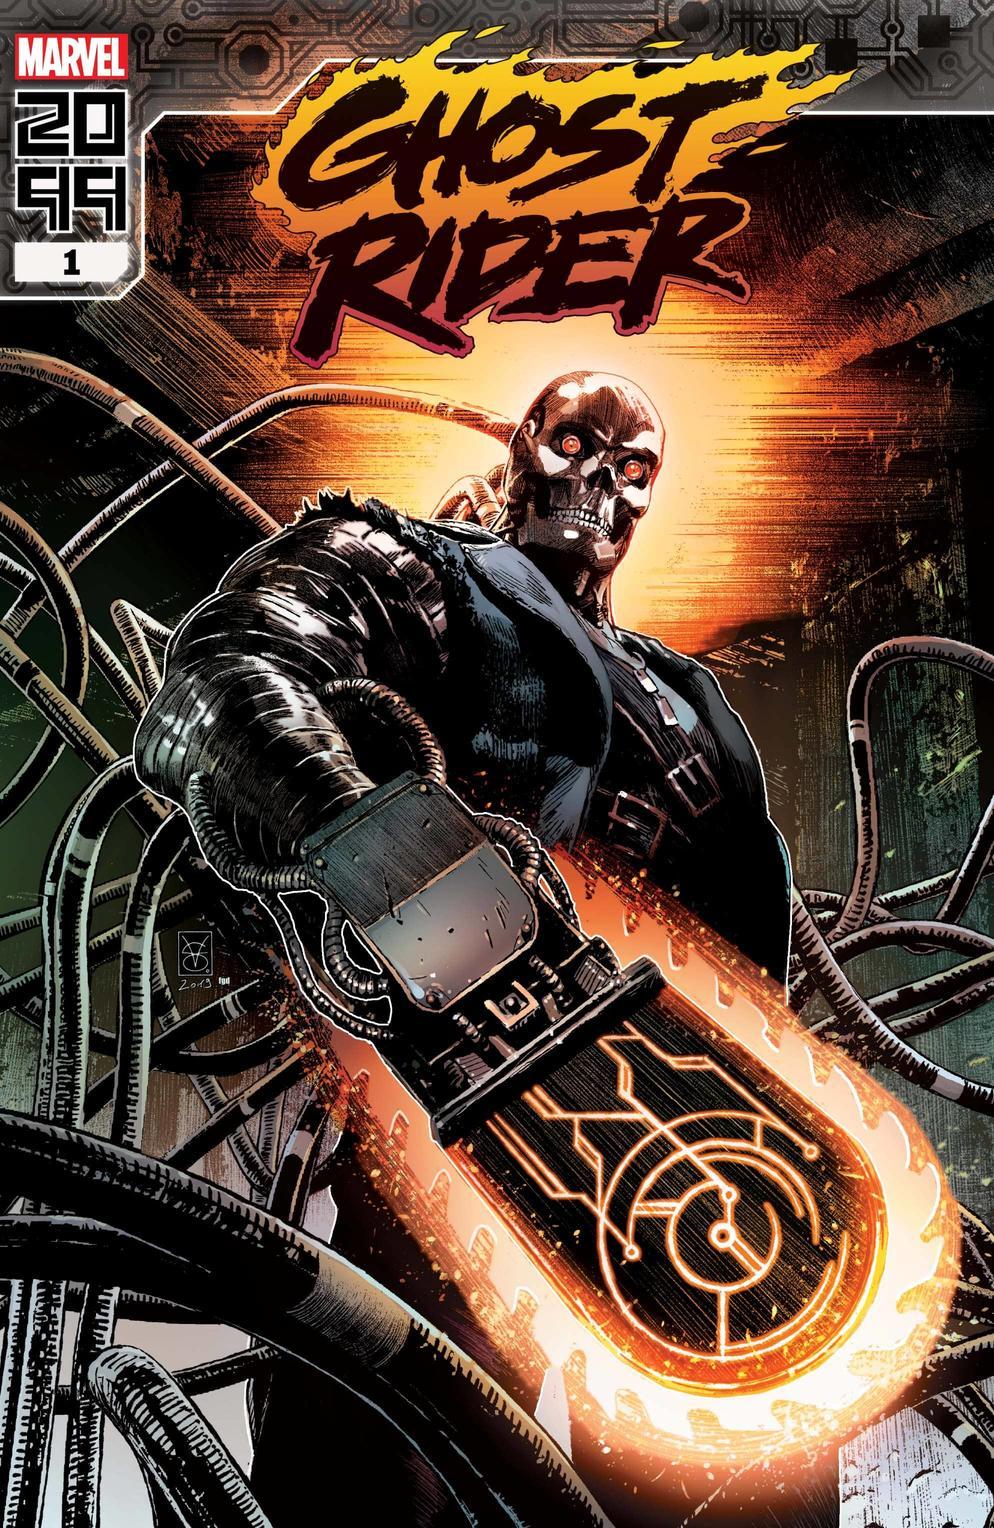 Ghost Rider 2099 #1, copertina di Valerio Giangiordano